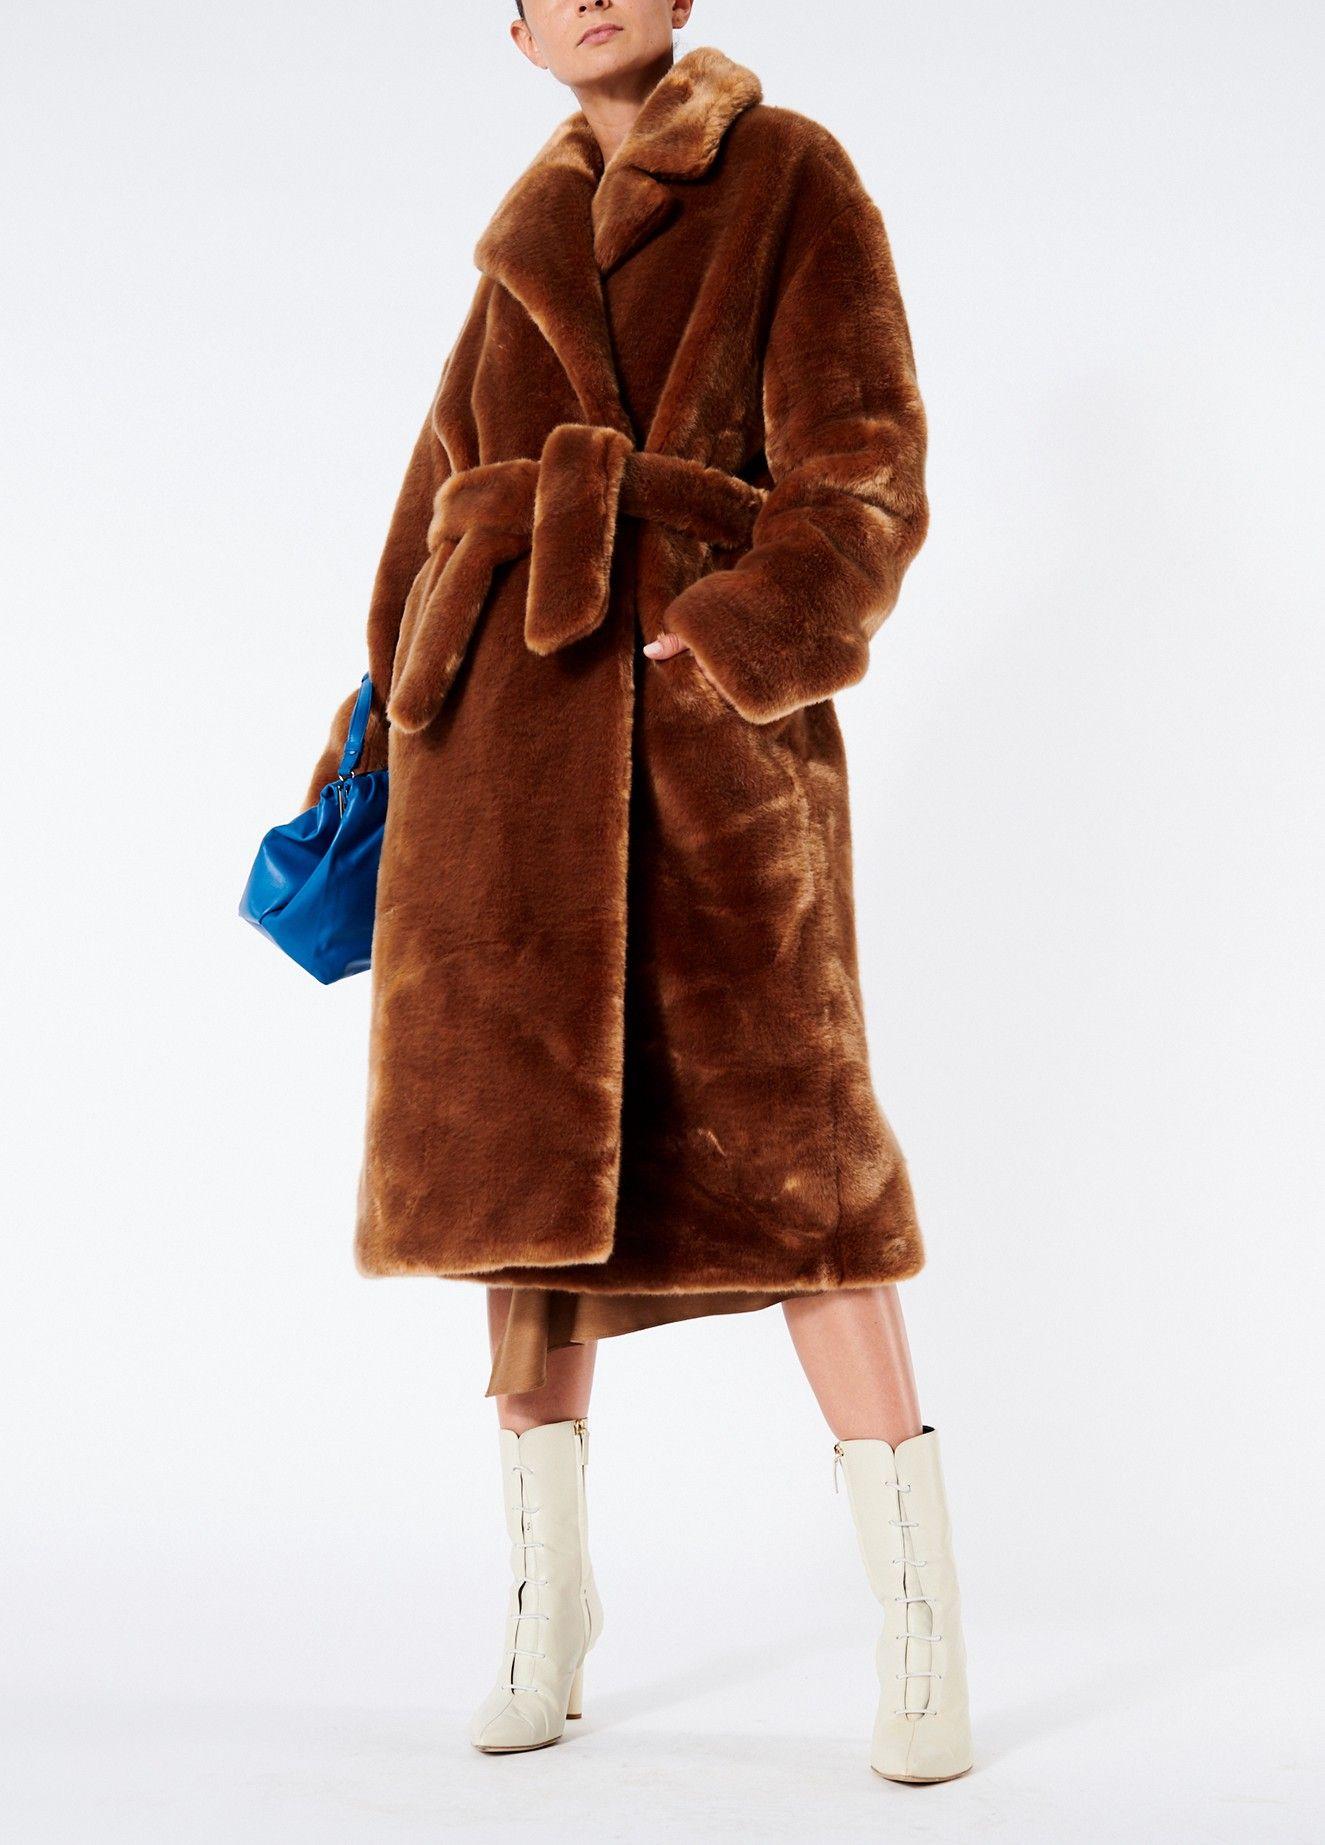 c51b828e1ebe Tibi Luxe Faux Fur Oversized Coat - Cocoa Brown Xxs Purple